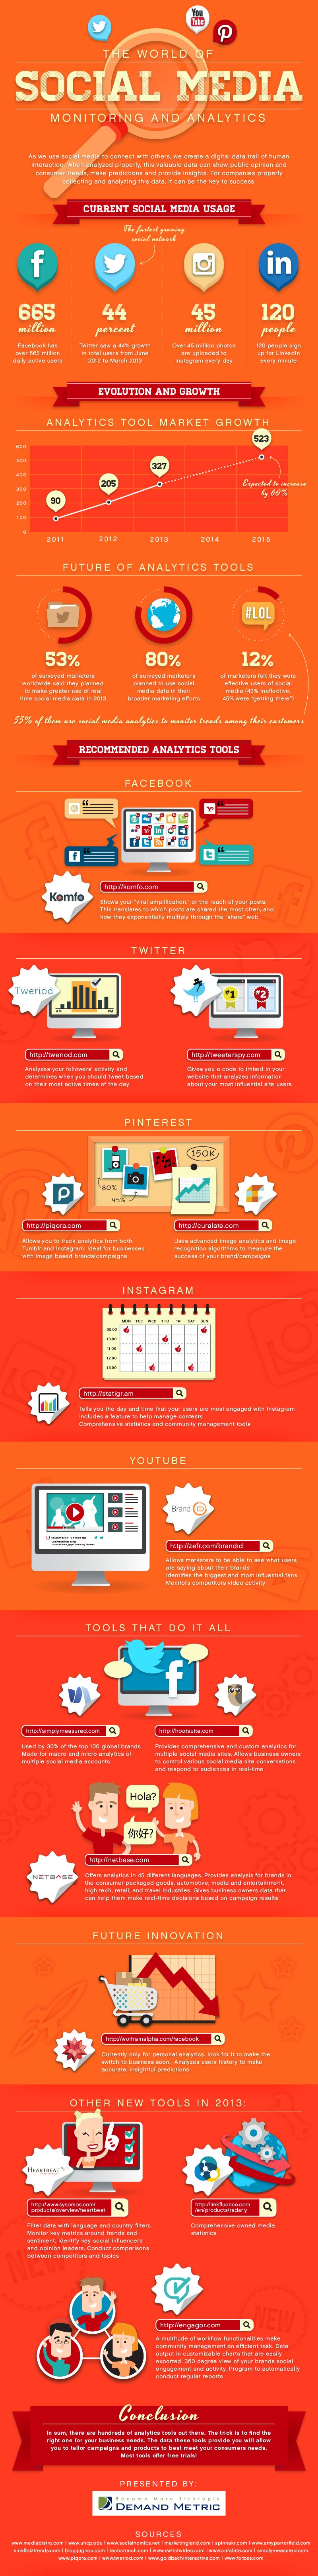 The World of Social Media Monitoring -14 Social Media Analytics Tools - infographic